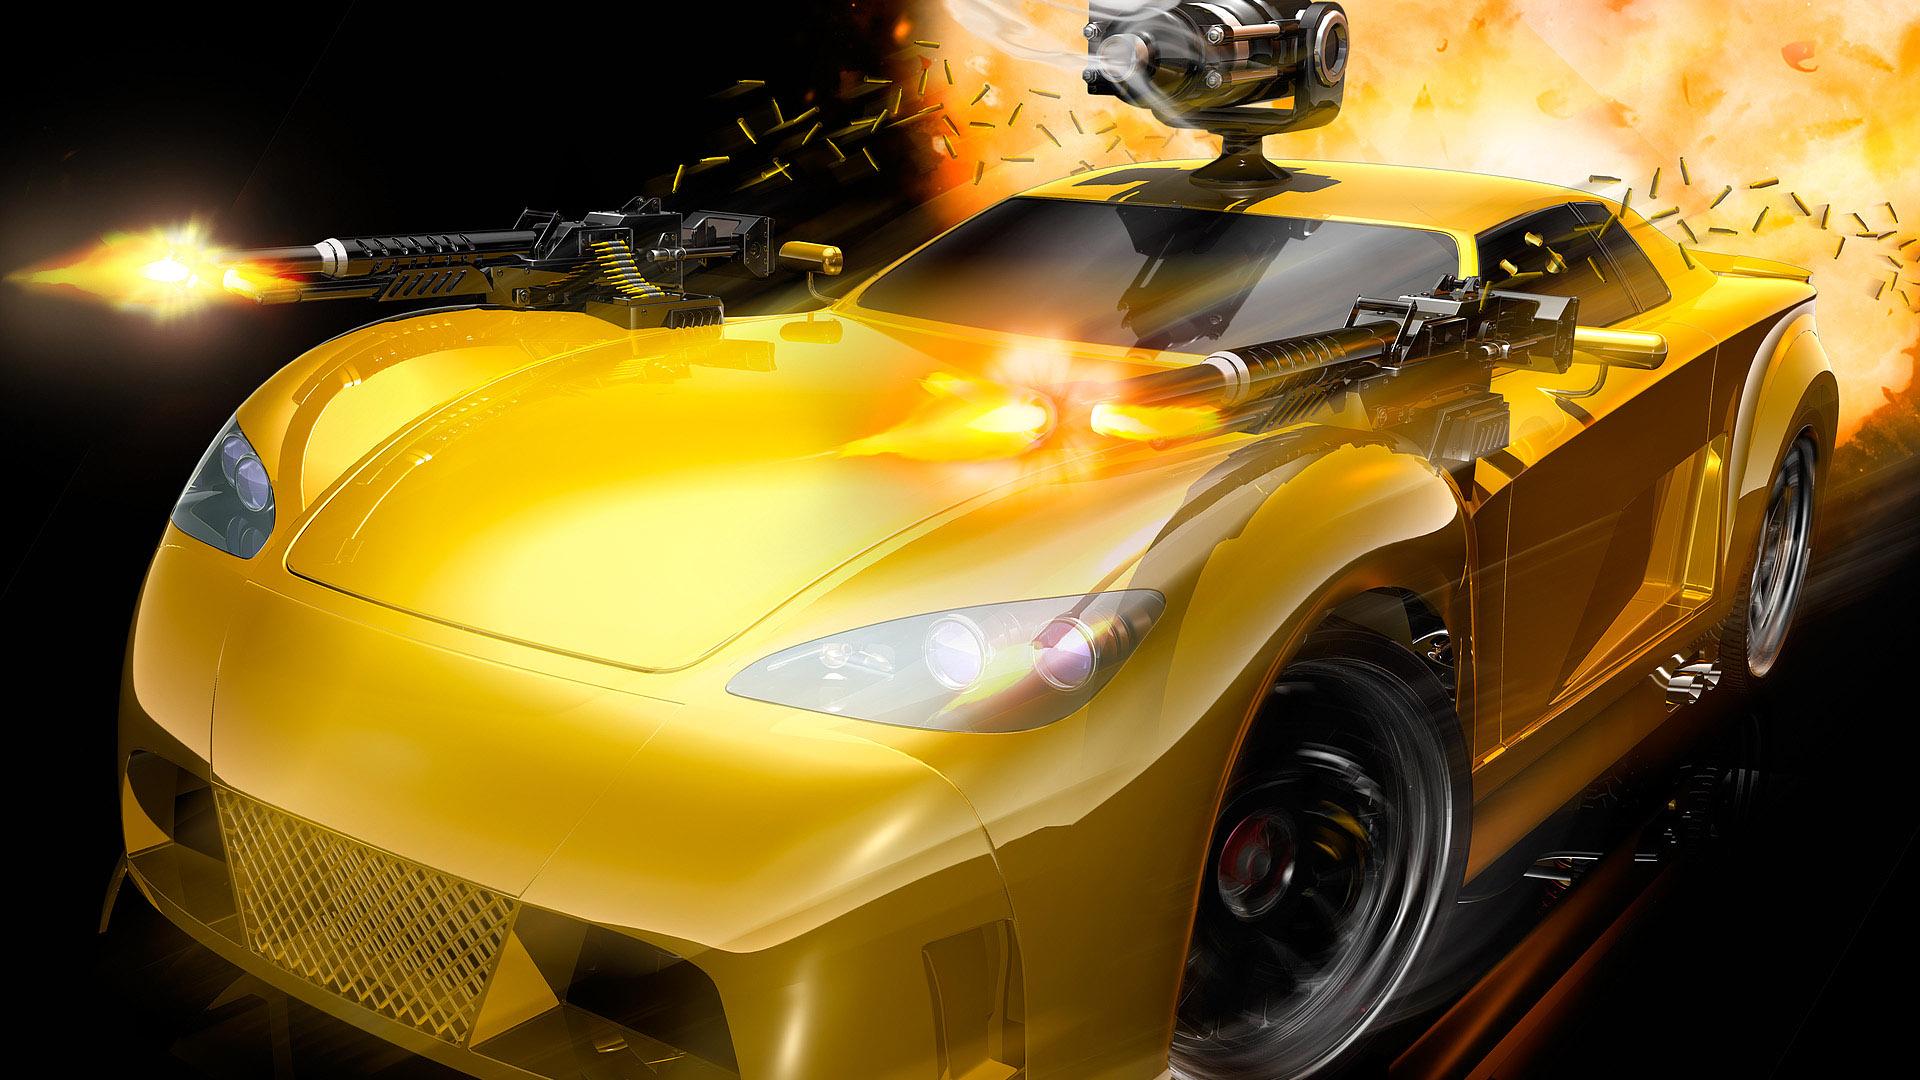 https://myfavouriteworld.files.wordpress.com/2011/04/car-game-1.jpg Cool